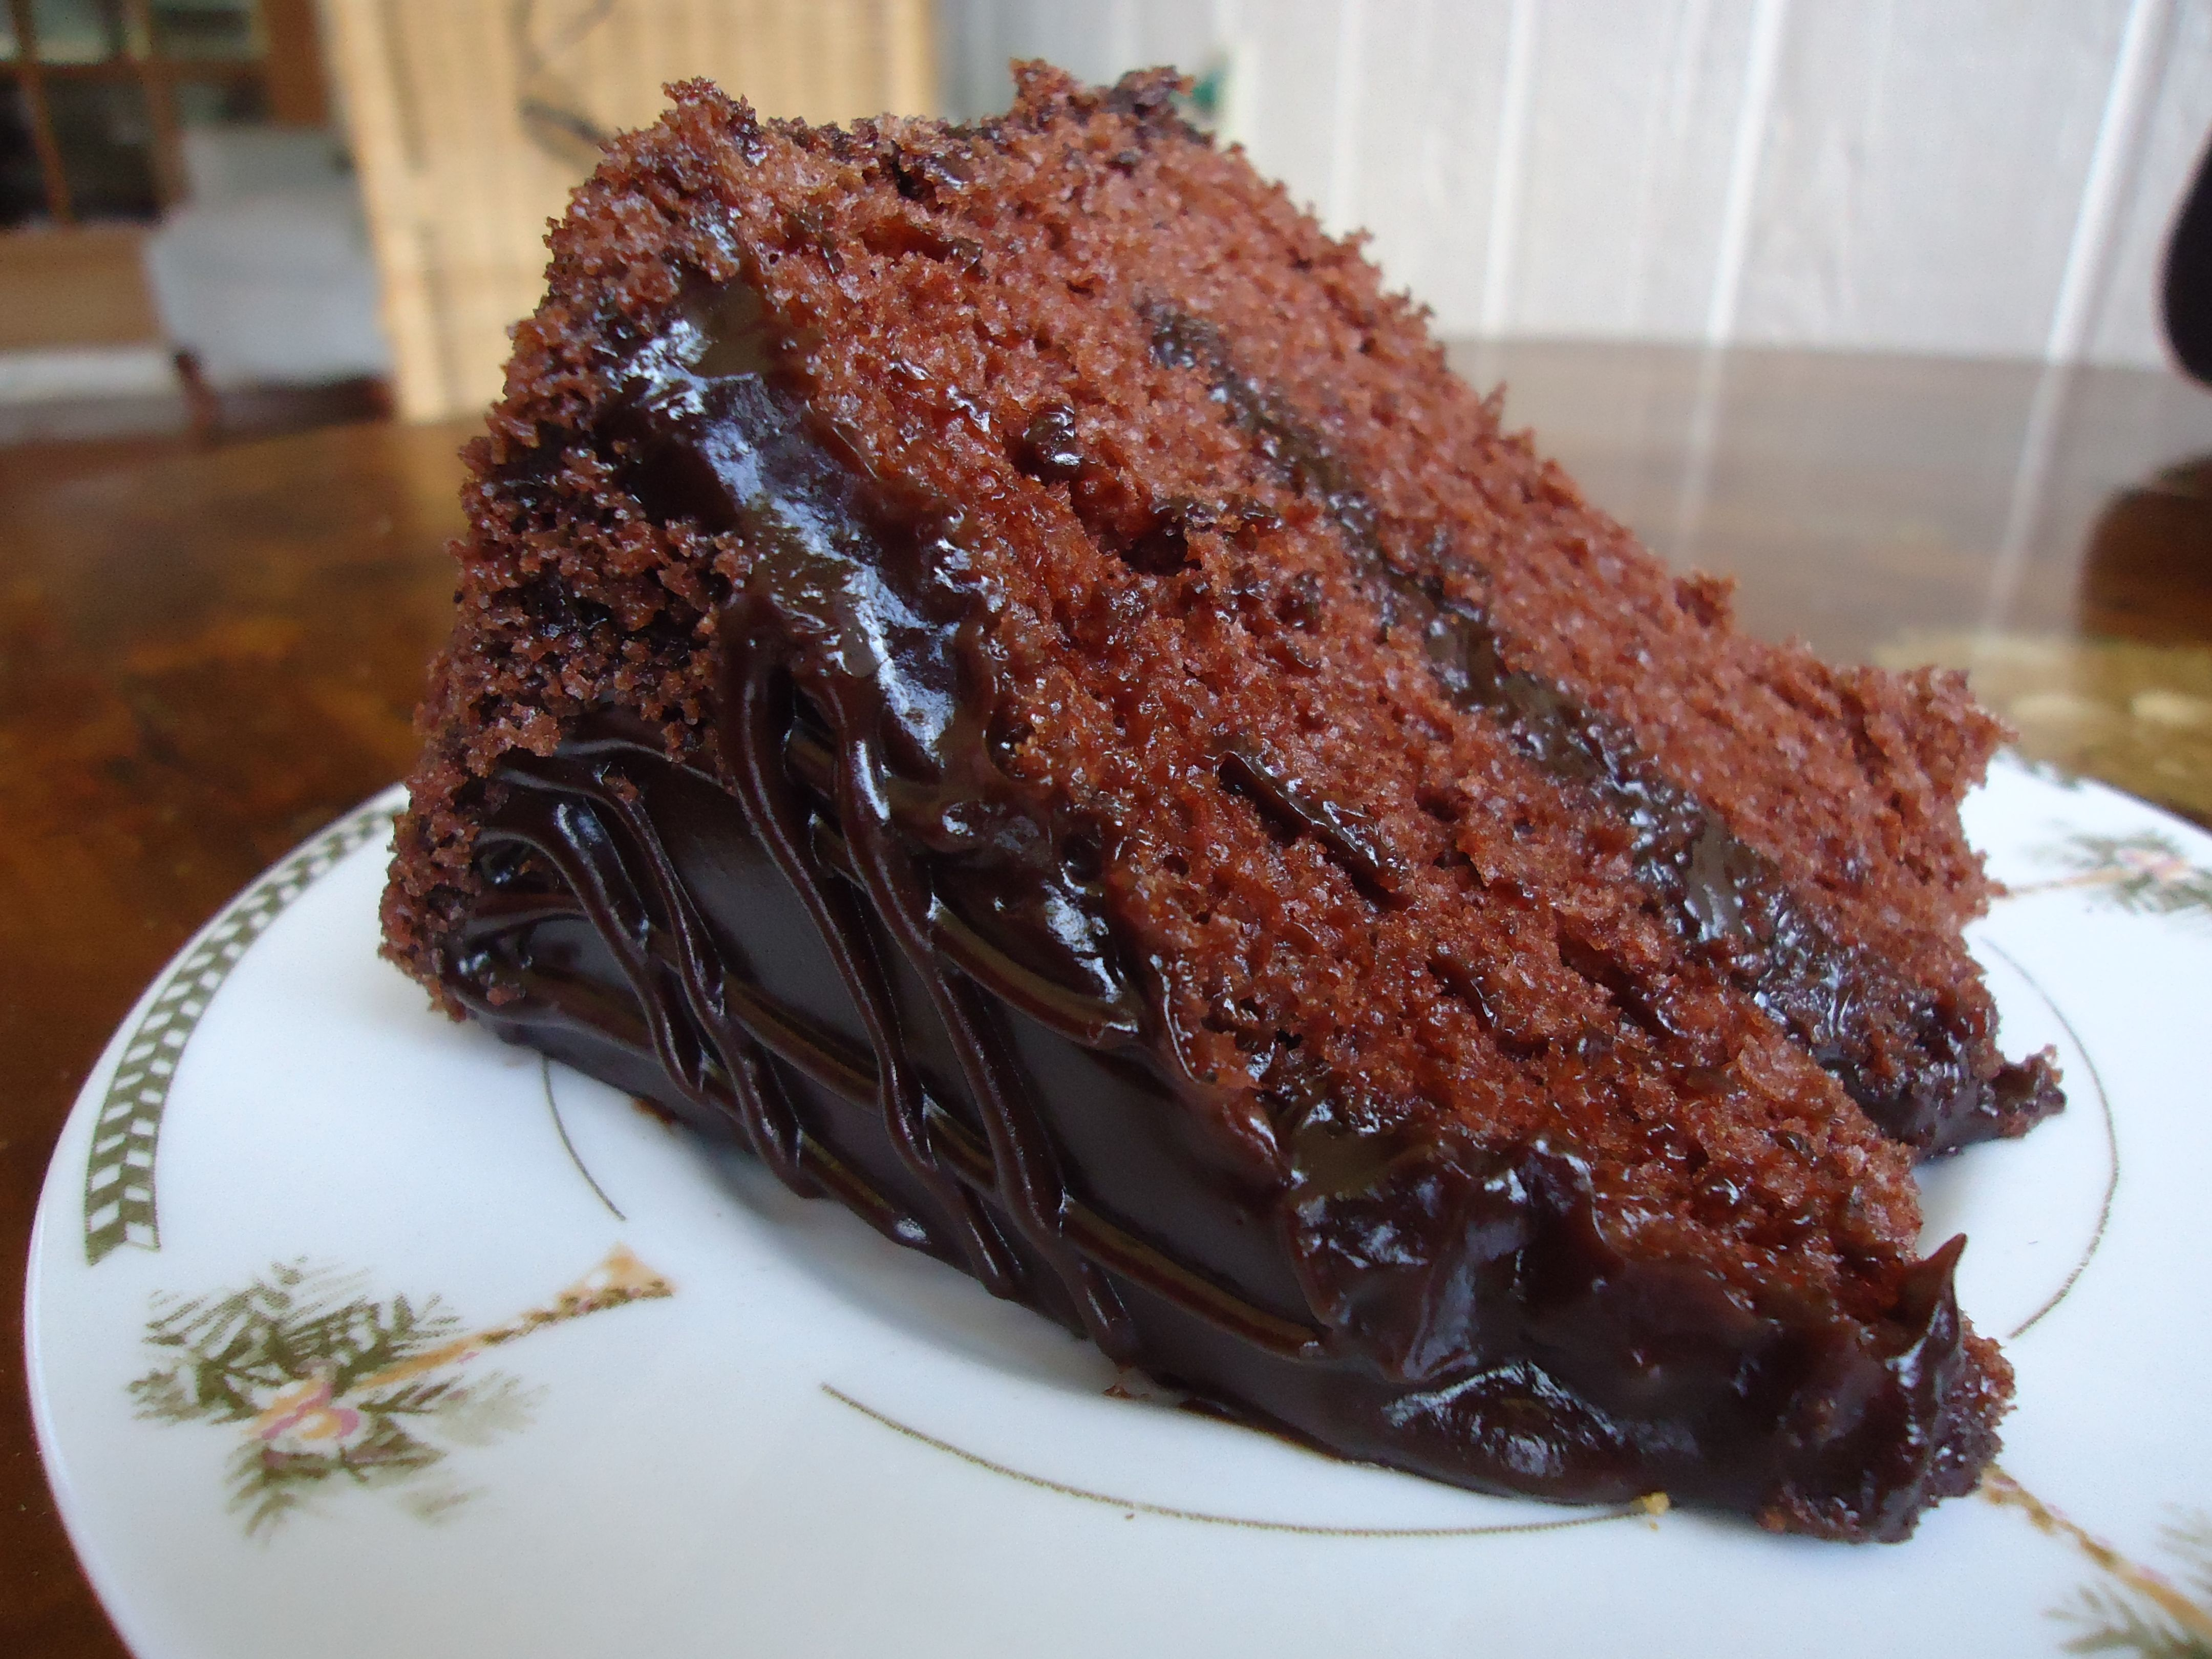 Chocolate dobash cake from napoleons bakery in hawaii i